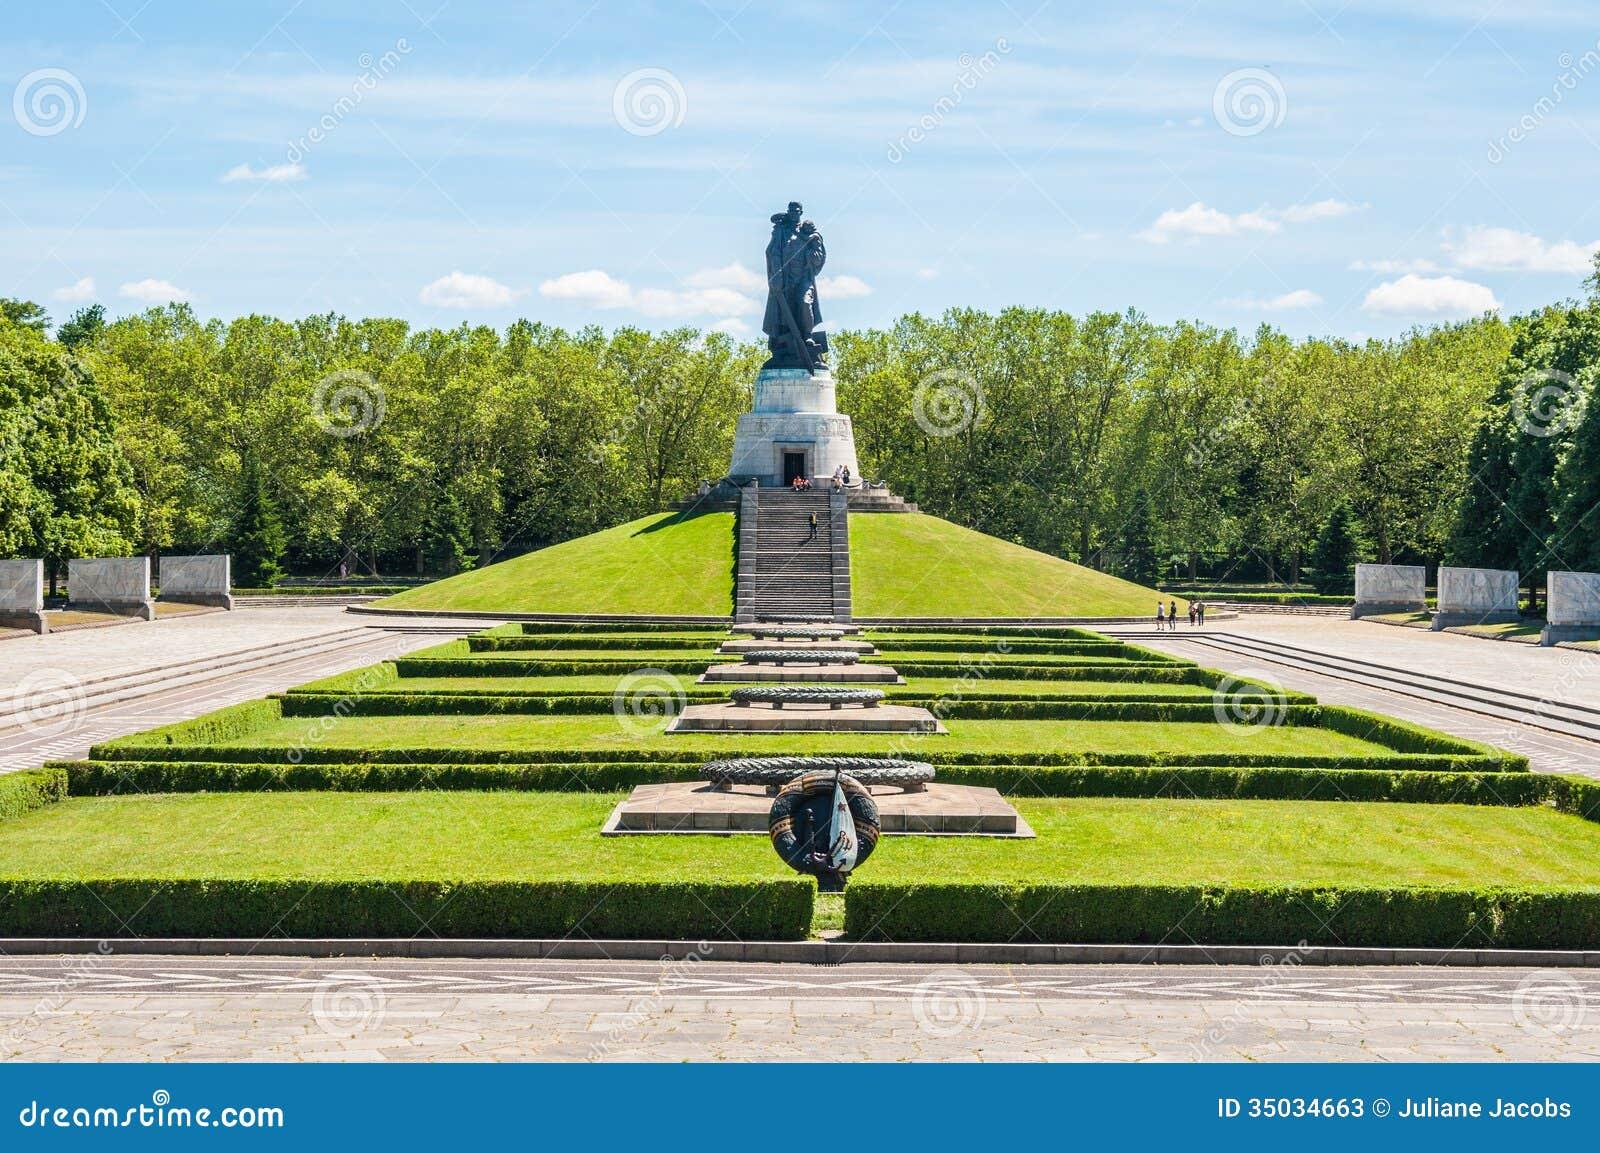 soviet war memorial stock image image of treptow landmark 35034663. Black Bedroom Furniture Sets. Home Design Ideas